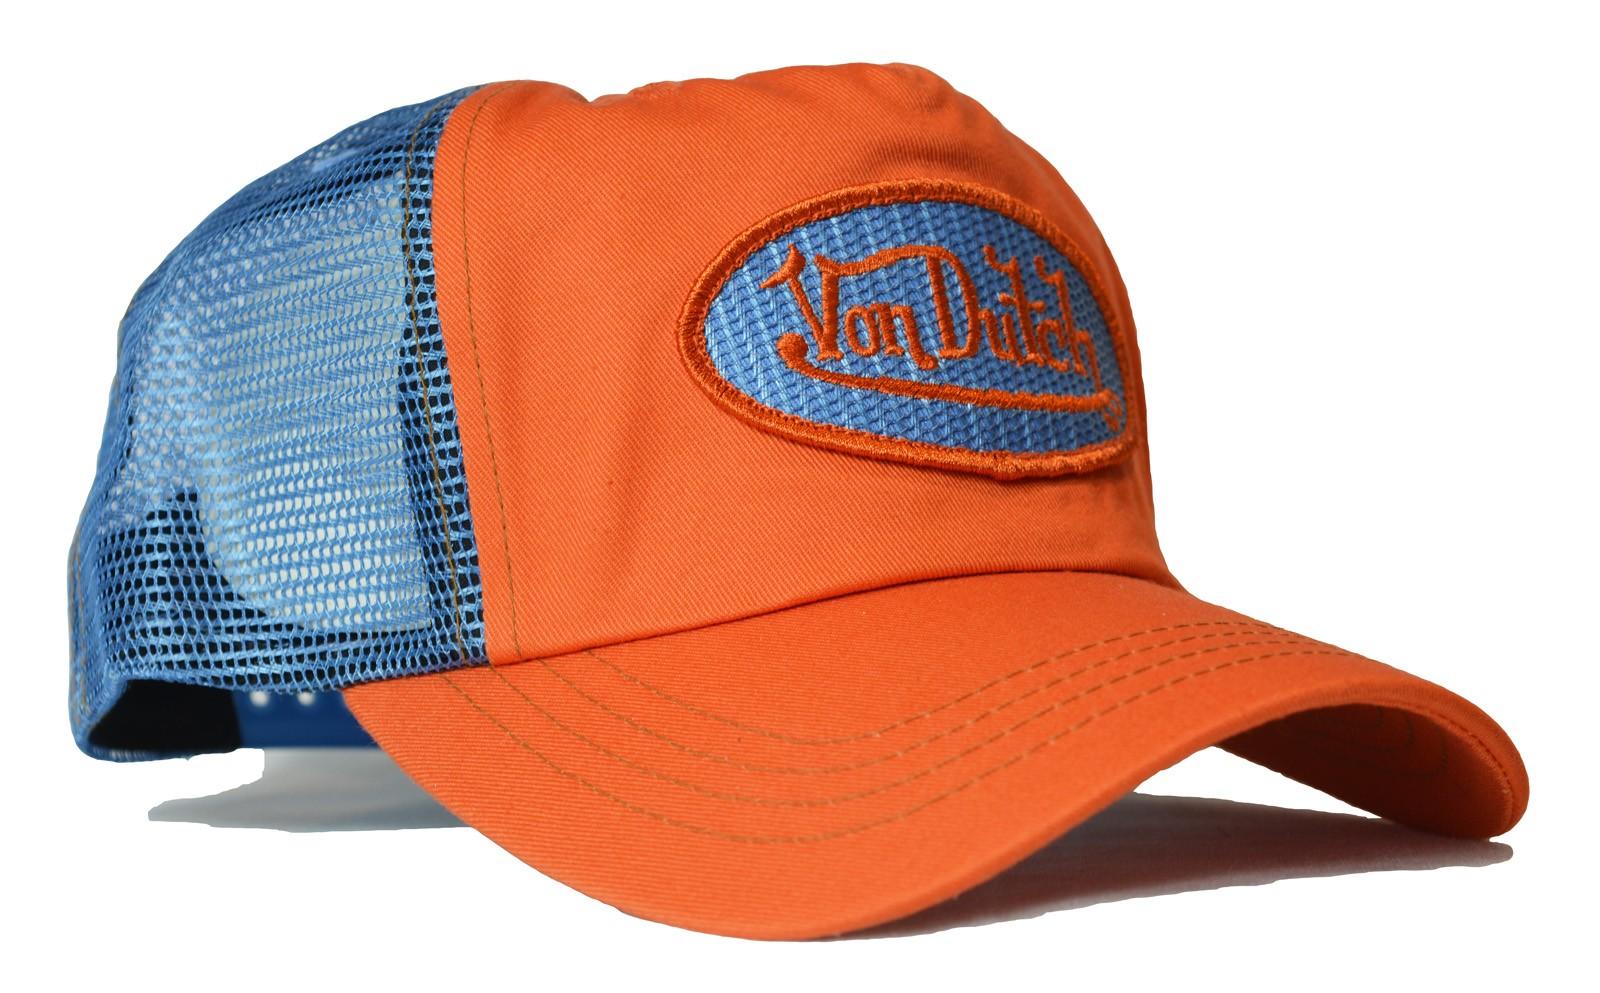 Von Dutch - Classic Orange/Blue Mesh Trucker Cap